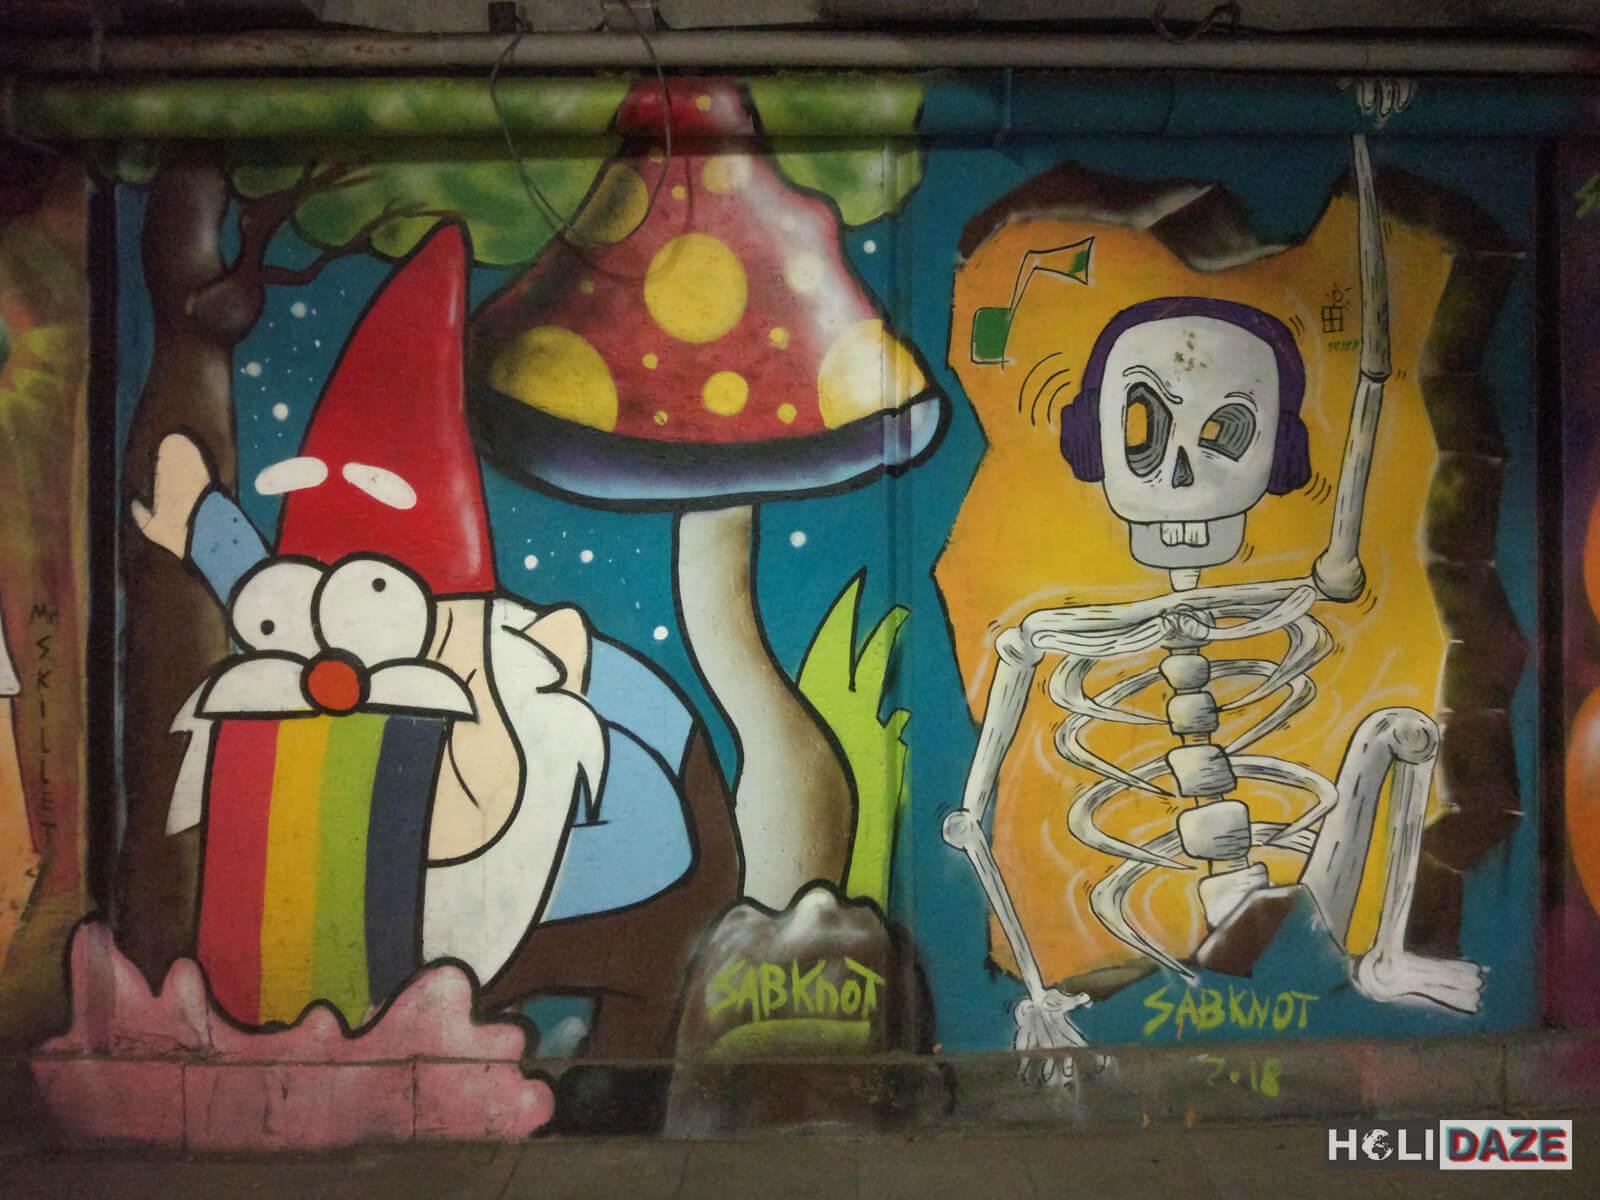 Tbilisi street art featuring elves, mushrooms and skeletons